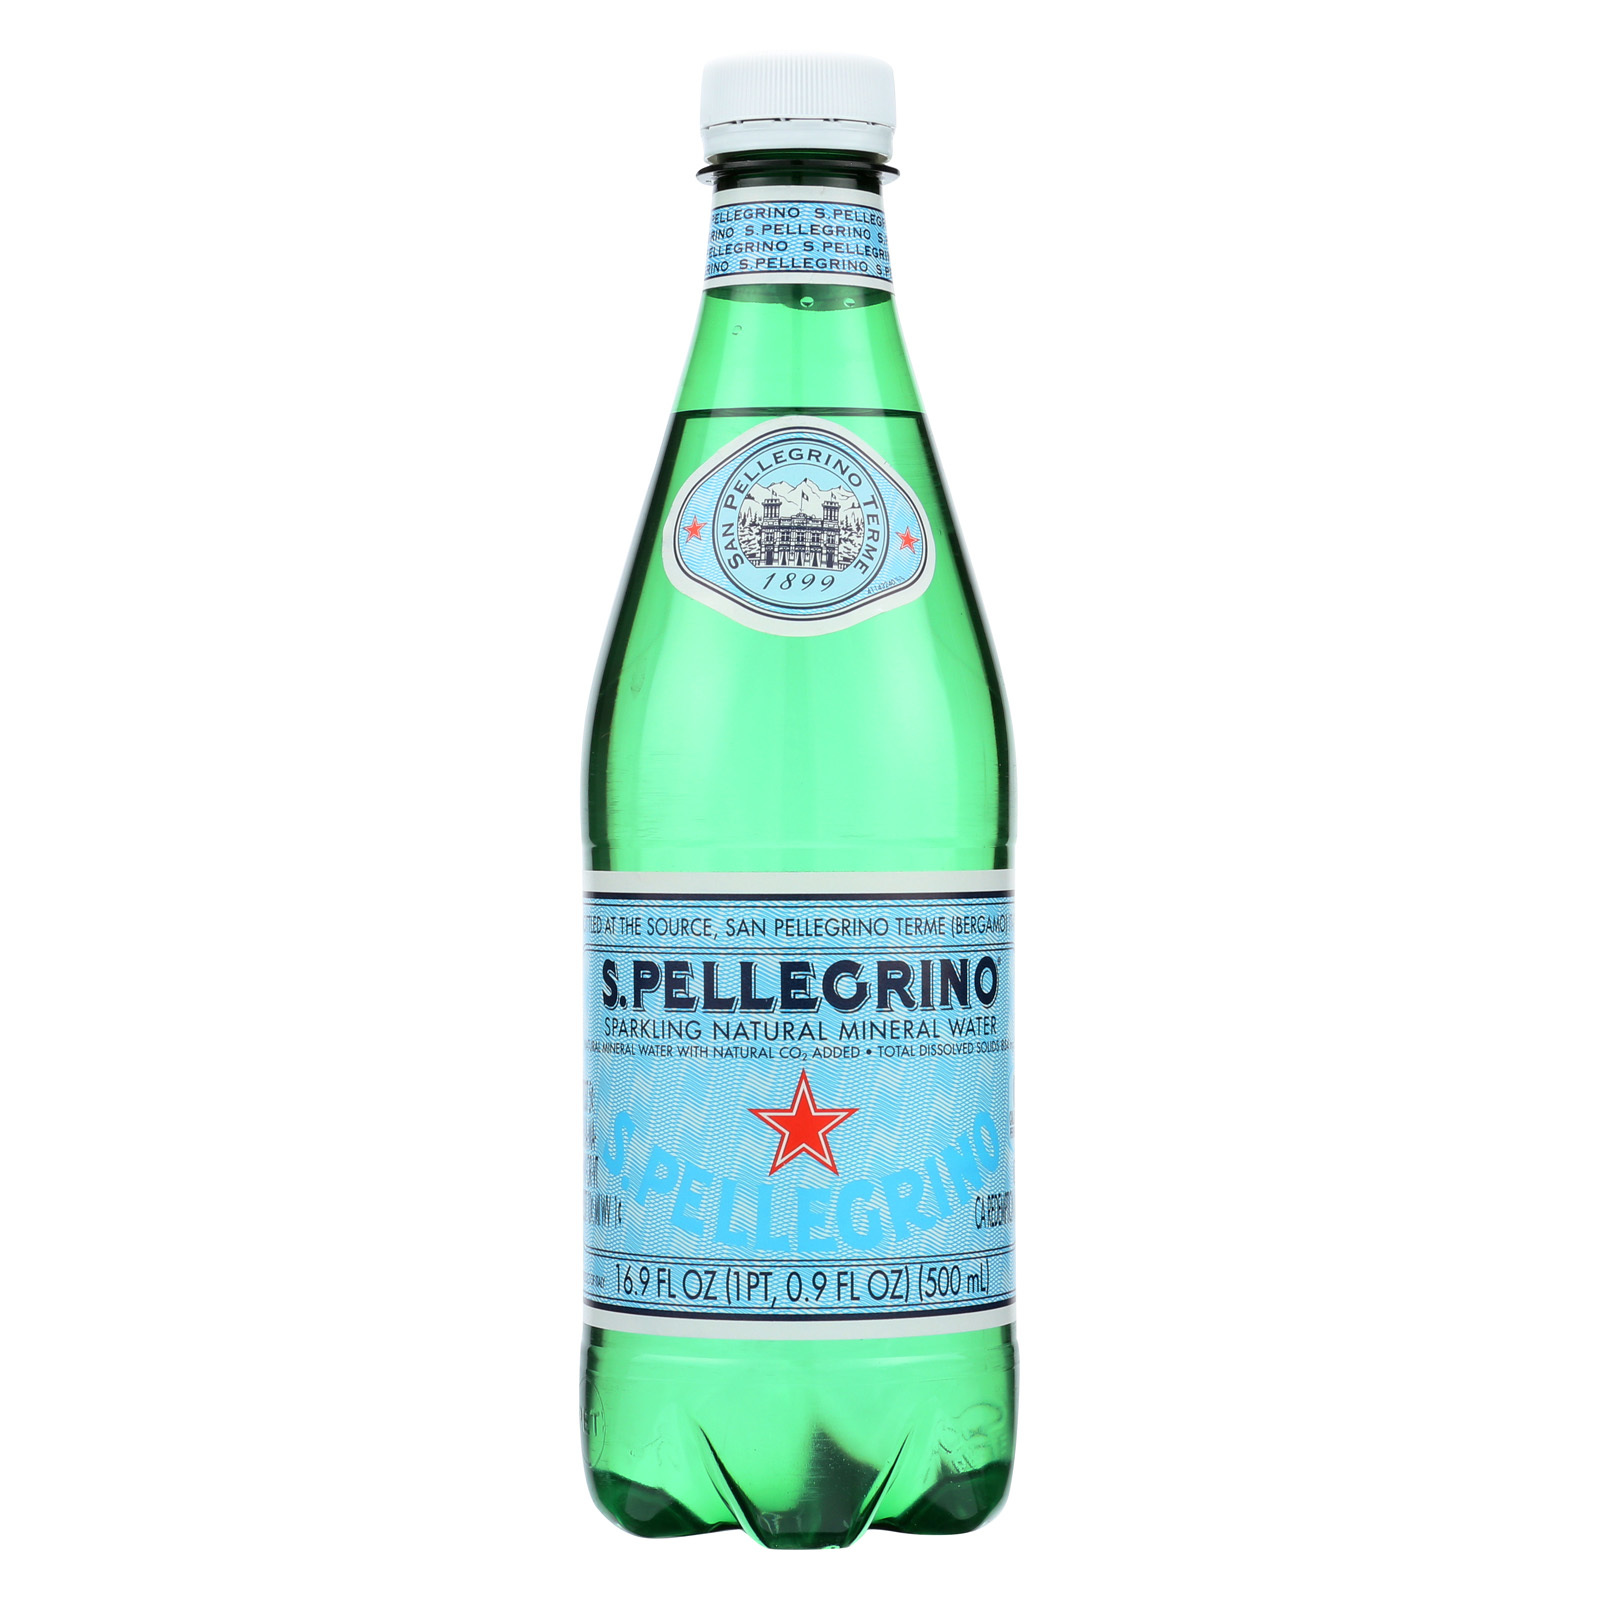 San Pellegrino Sparkling Mineral Water - Natural - Case of 24 - 0.5 Liter